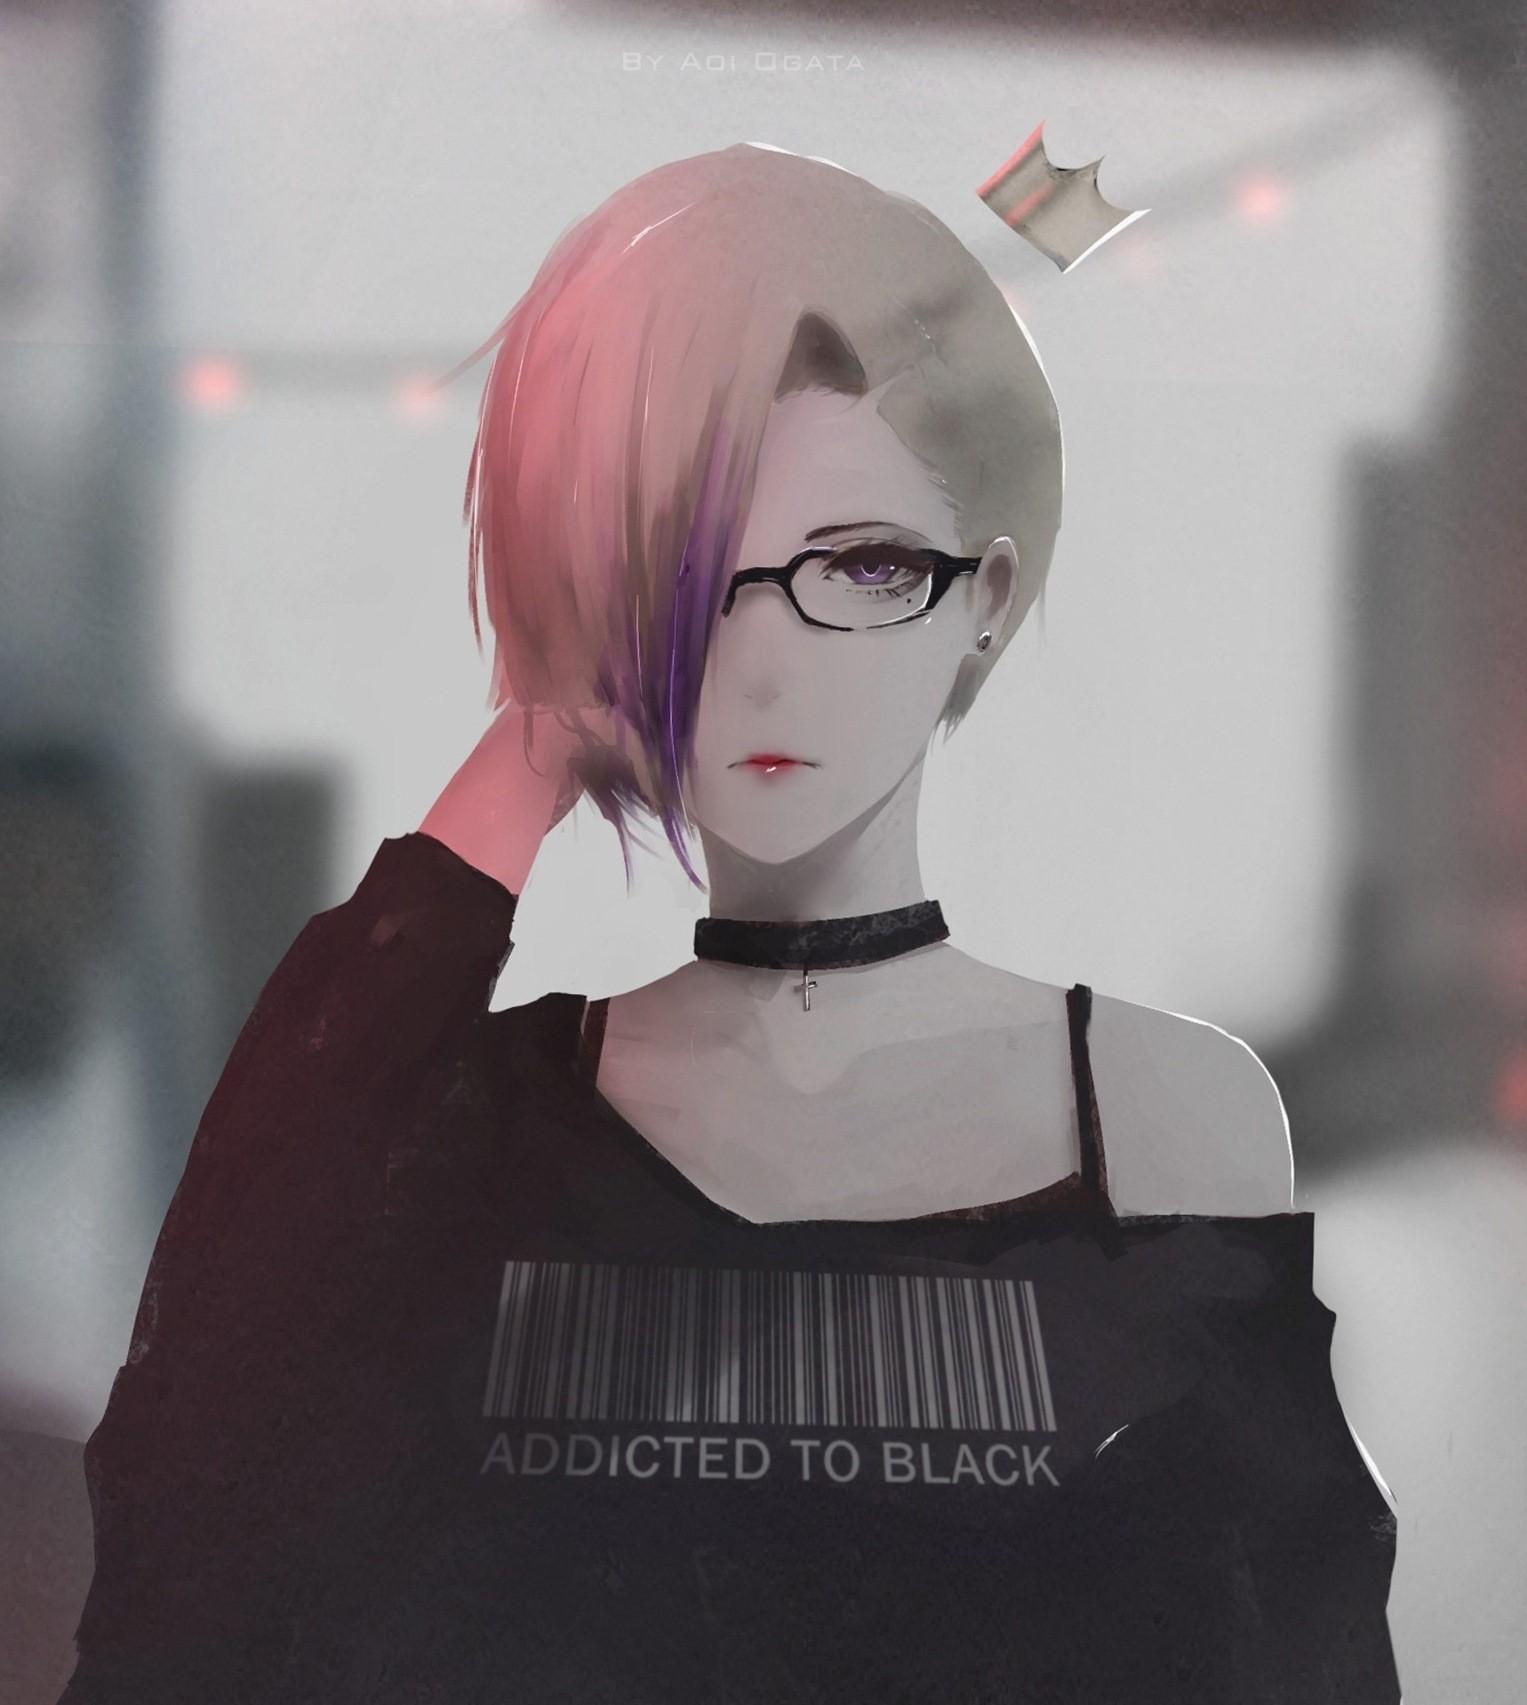 Aoi ogata mariav2213